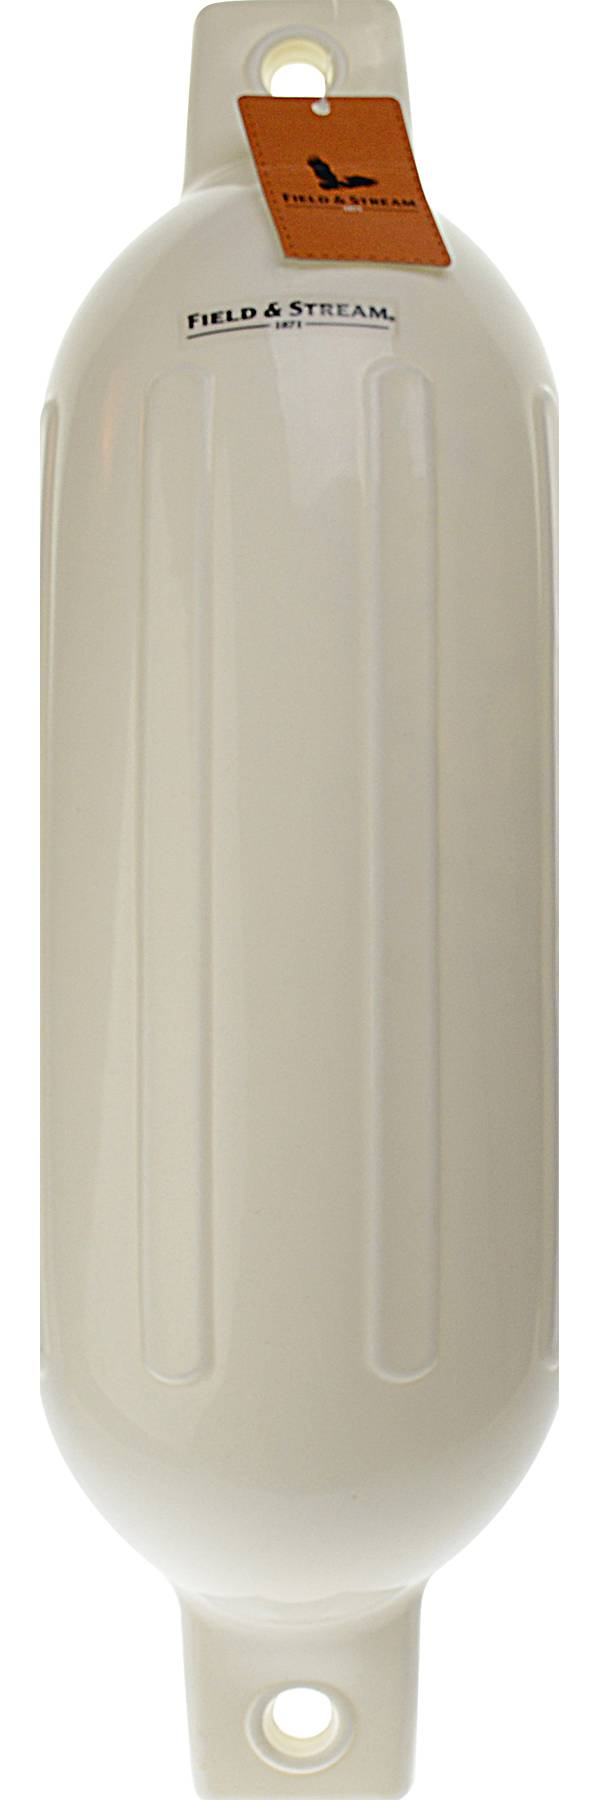 Field & Stream Inflatable Marine Fender product image